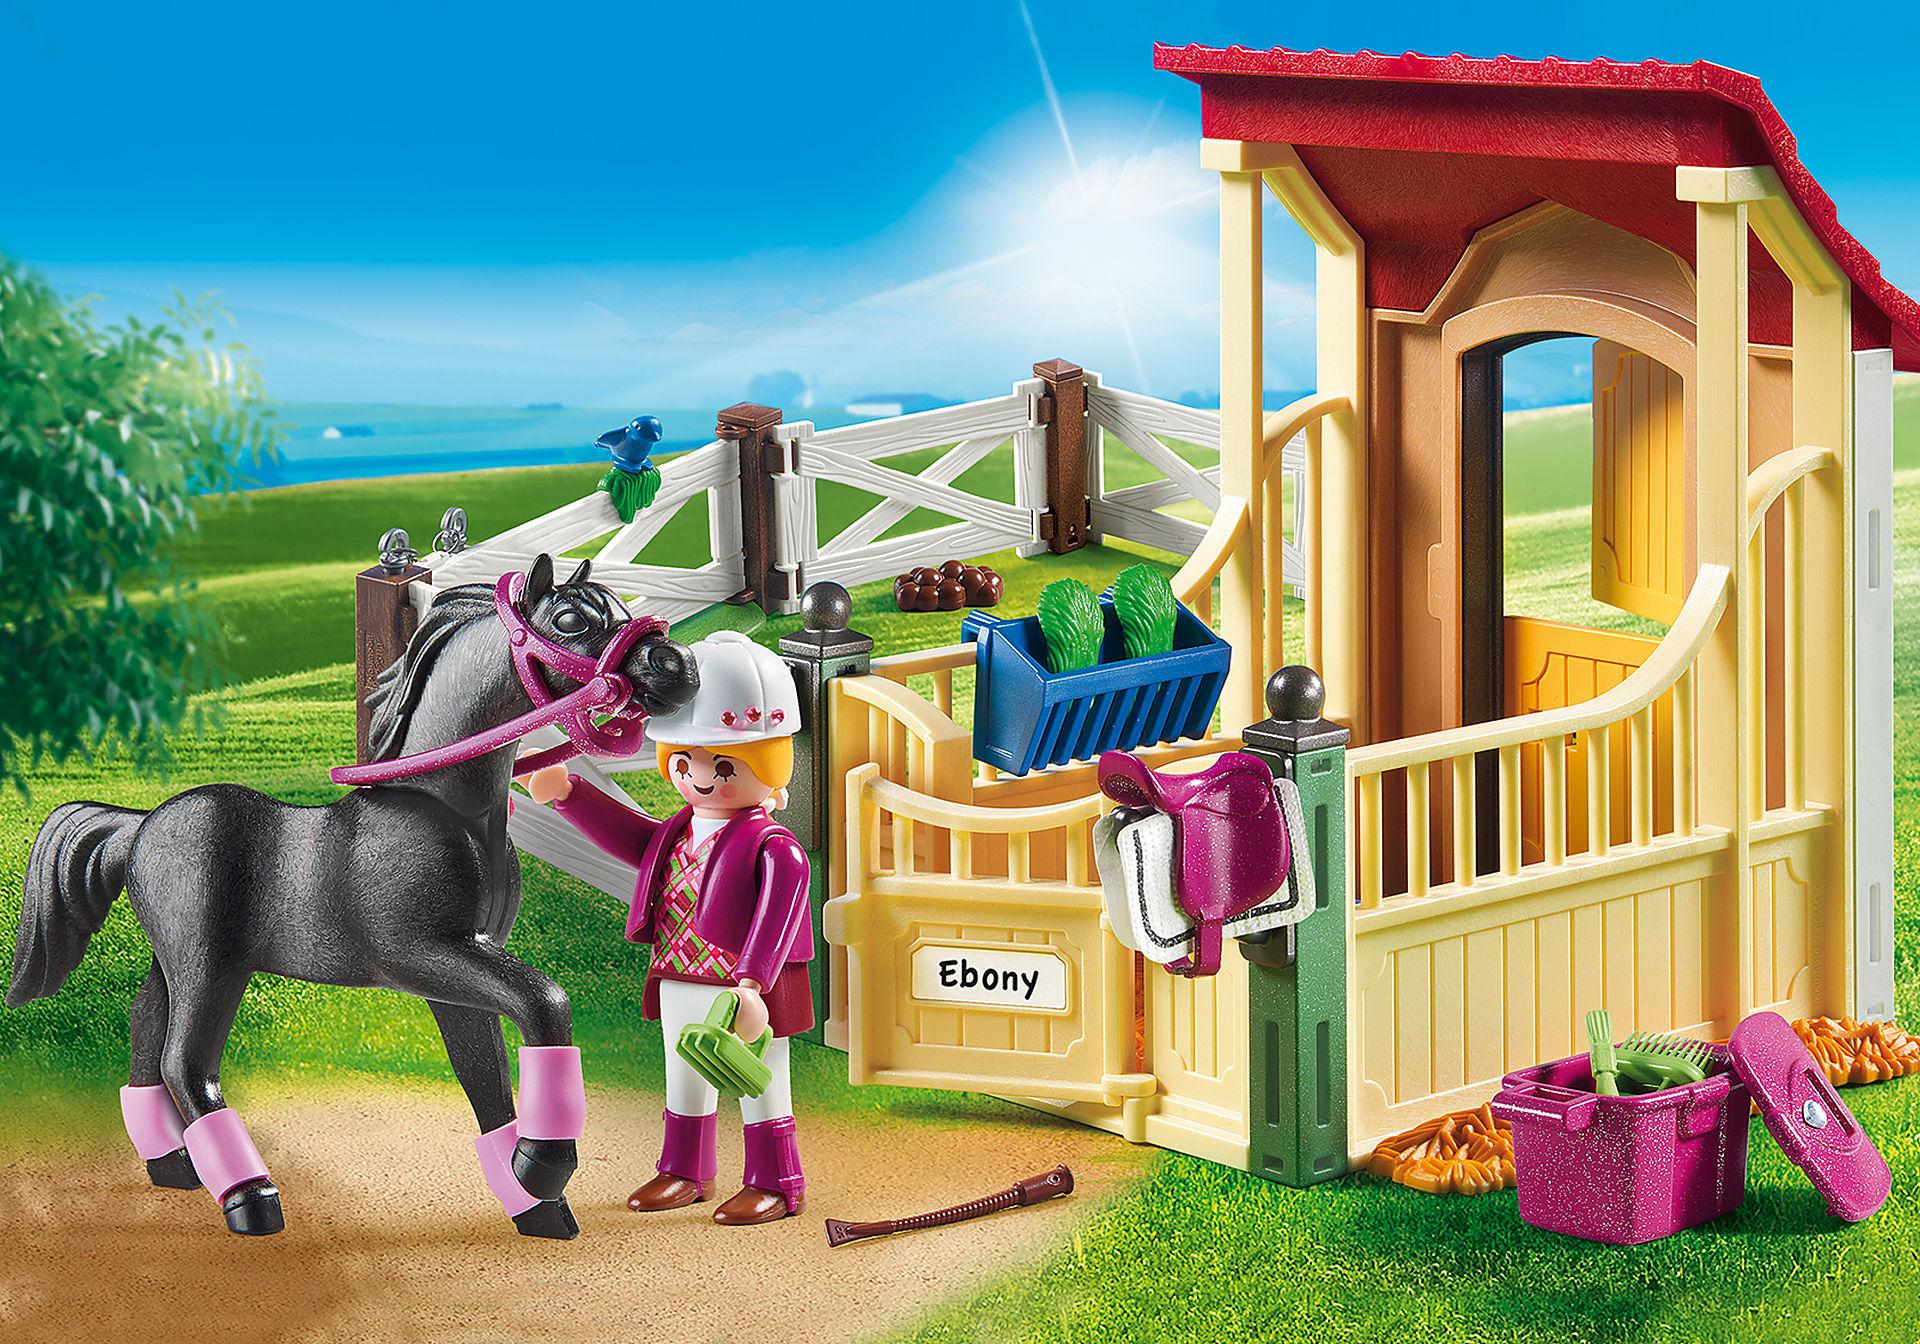 http://media.playmobil.com/i/playmobil/6934_product_detail/Arabier met paardenbox